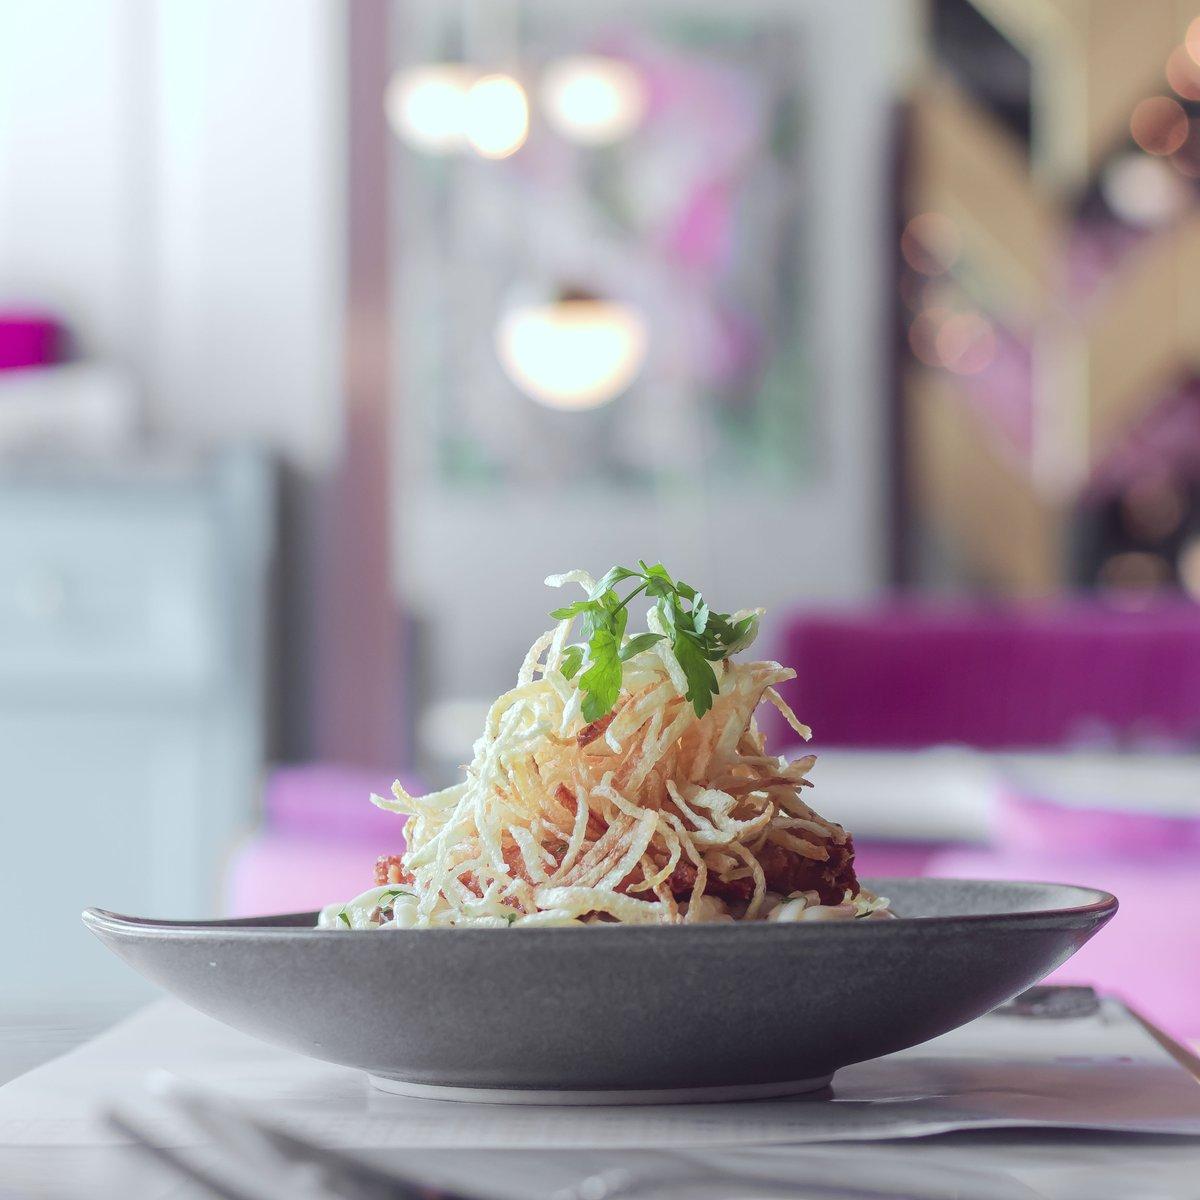 Enjoy an authentic and aromatic flavours of Our Fucini mushroom.  فيتوتشينى سالد بوتيك بالفطر أعدت لكم بأفضل المكونات.  #سالادبوتيك  #الرياض  #salad_boutique  #salad  #food  #foody  #yummy  #instafood  #instagood